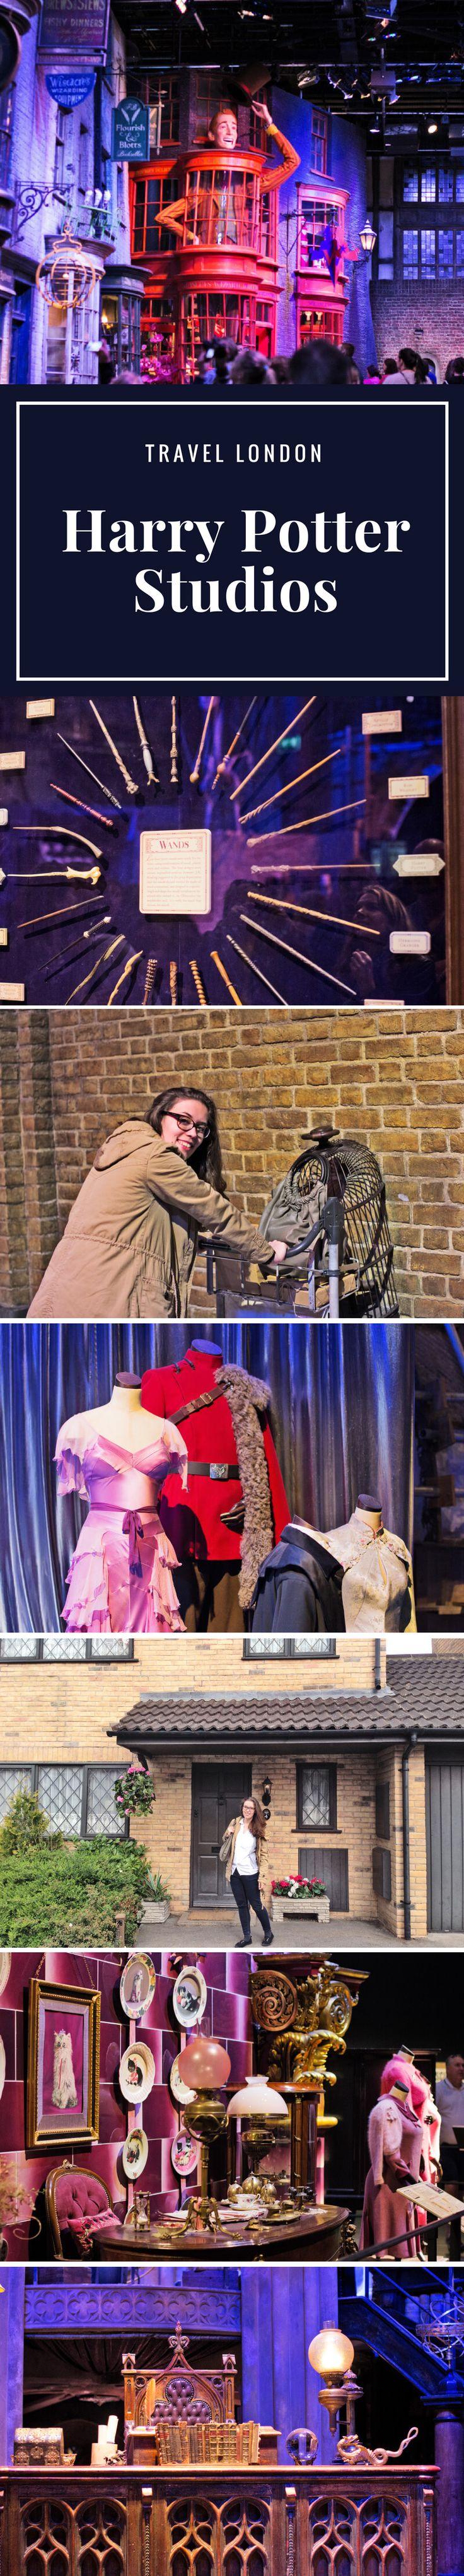 Kommt mit in die Harry Potter Studios!